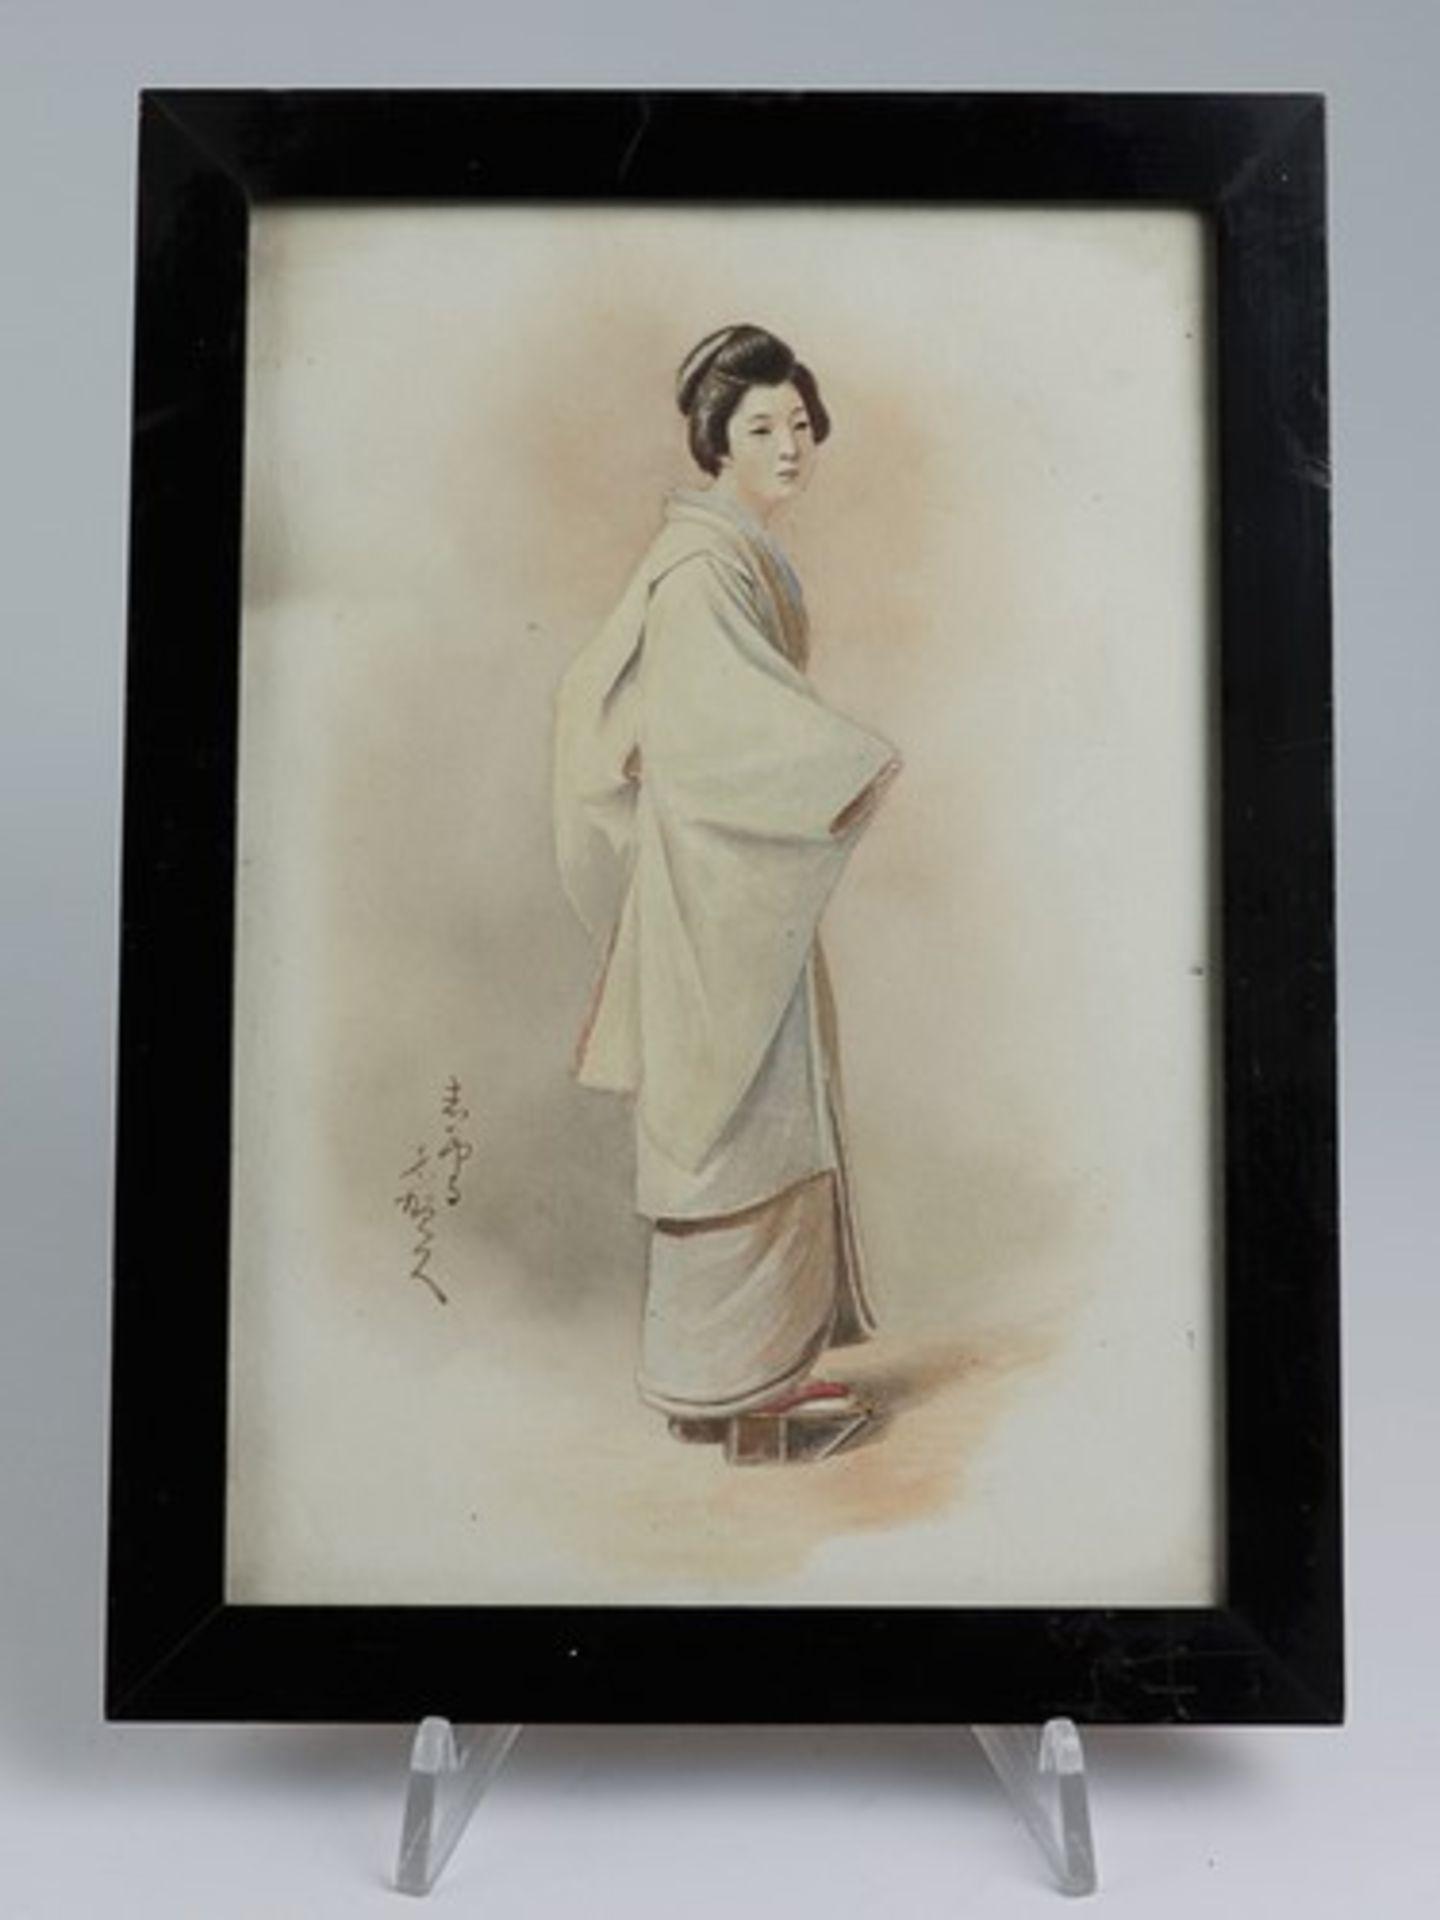 Los 1819 - Aquarell - Japanum 1910/20, japanische Dame in traditioneller Kleidung, l. sign., RhG, Ra.